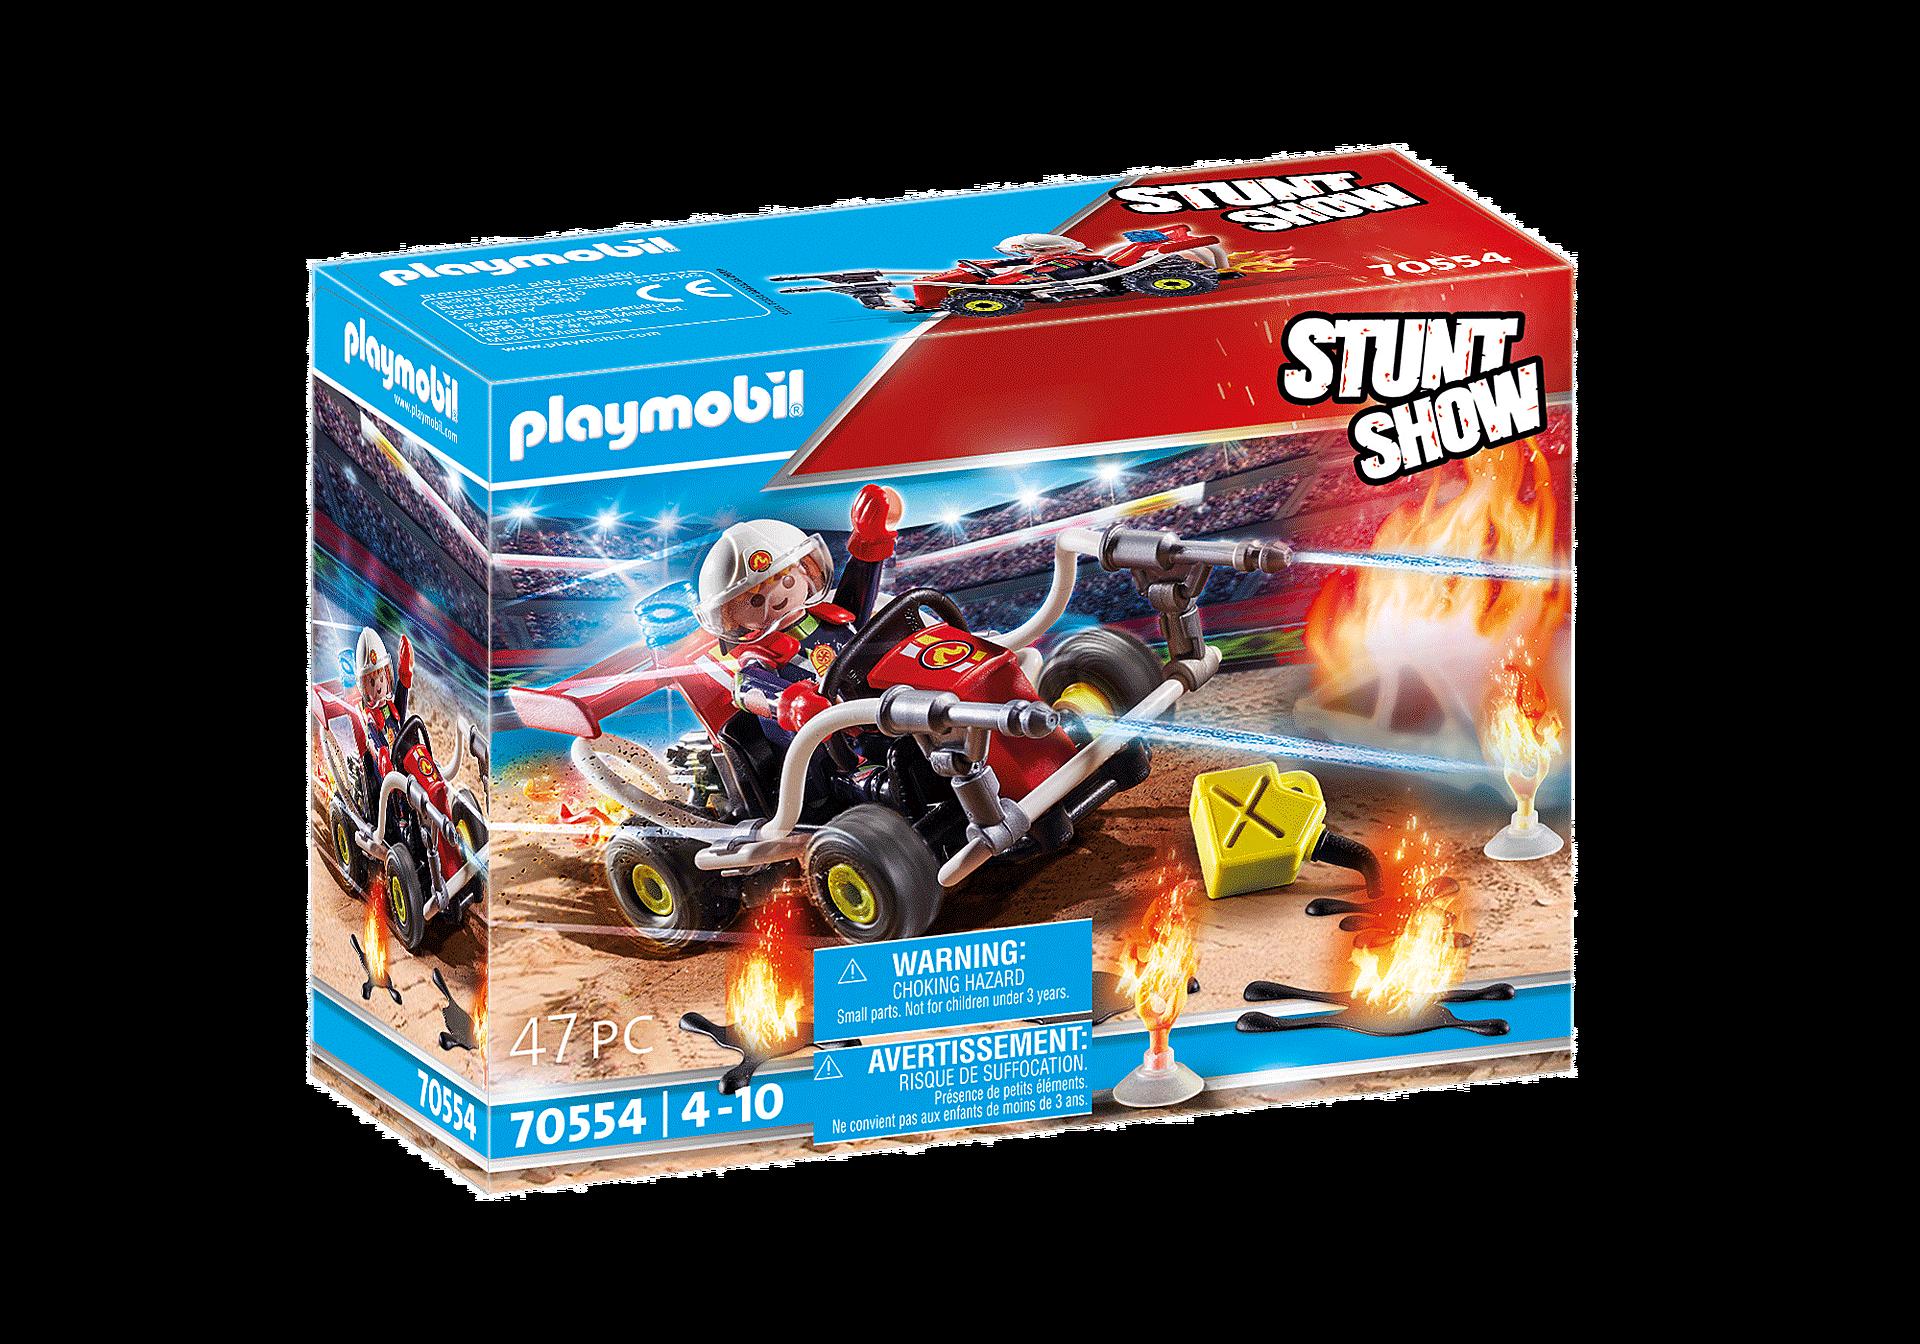 70554 Stunt Show Fire Quad zoom image2